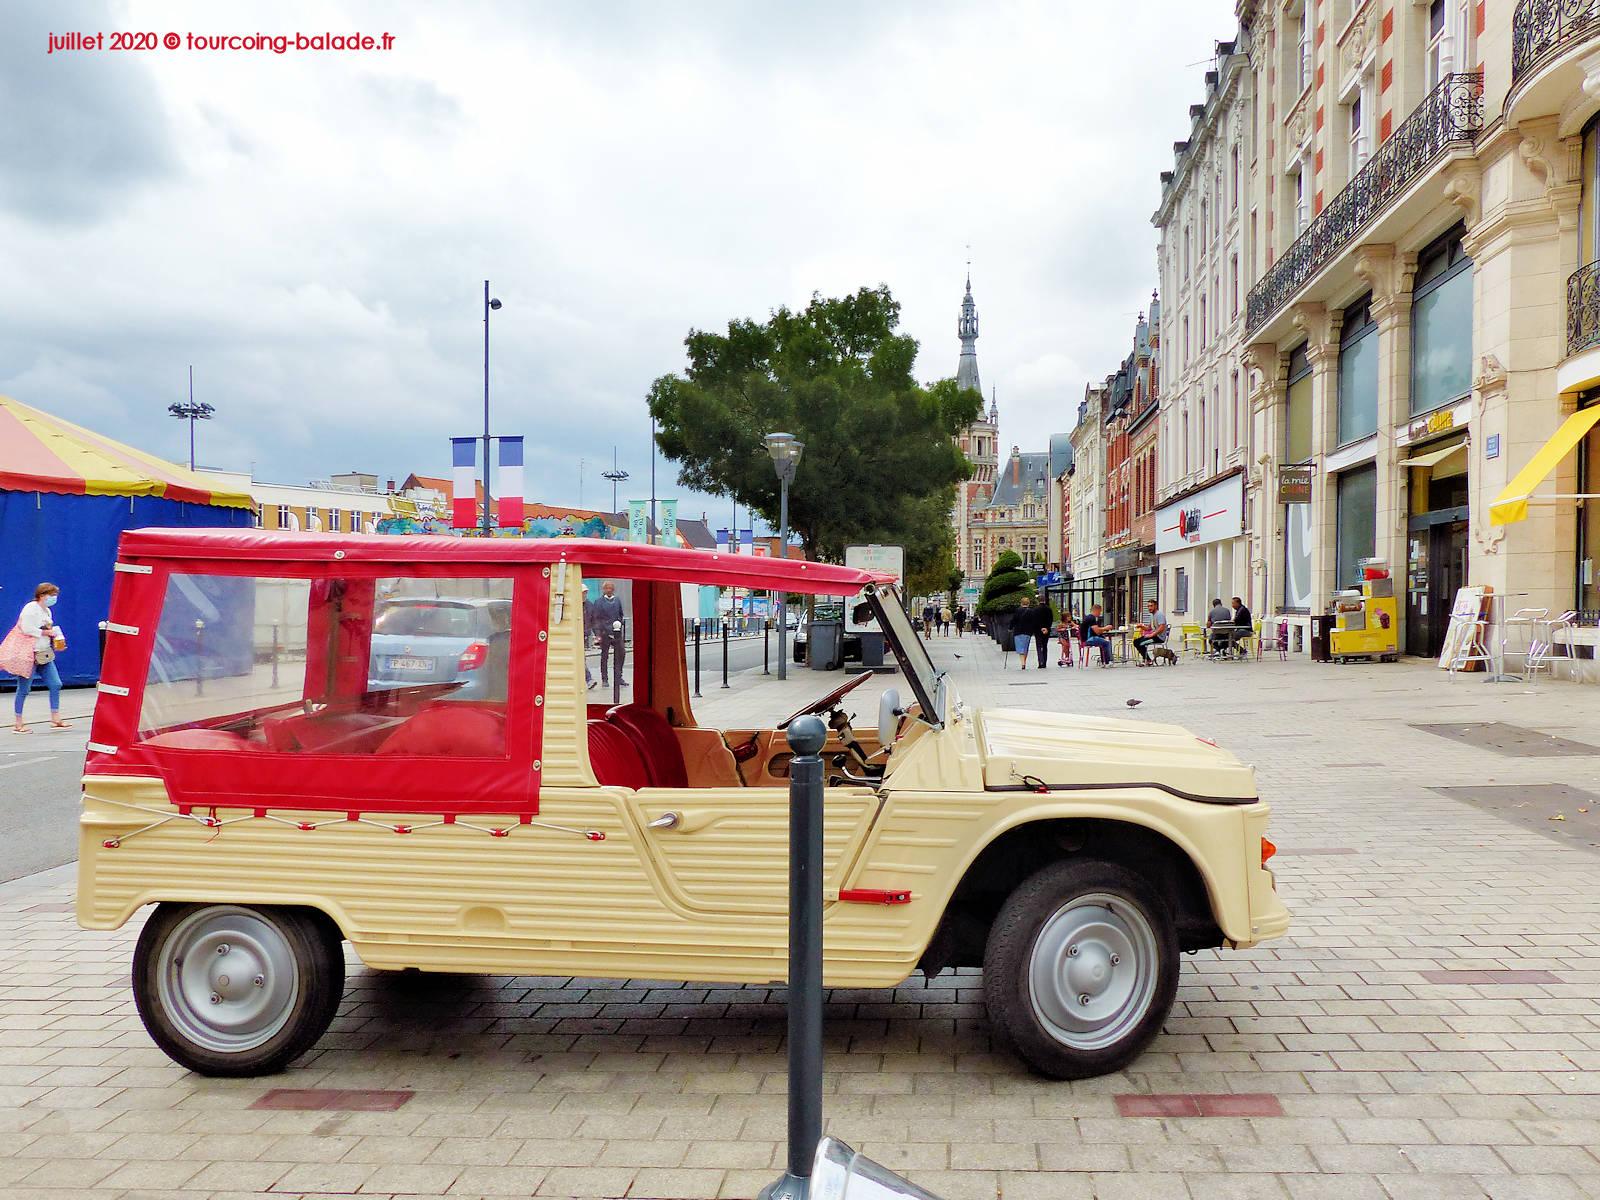 Mehari Citroën, Tourcoing Grand Place 2020